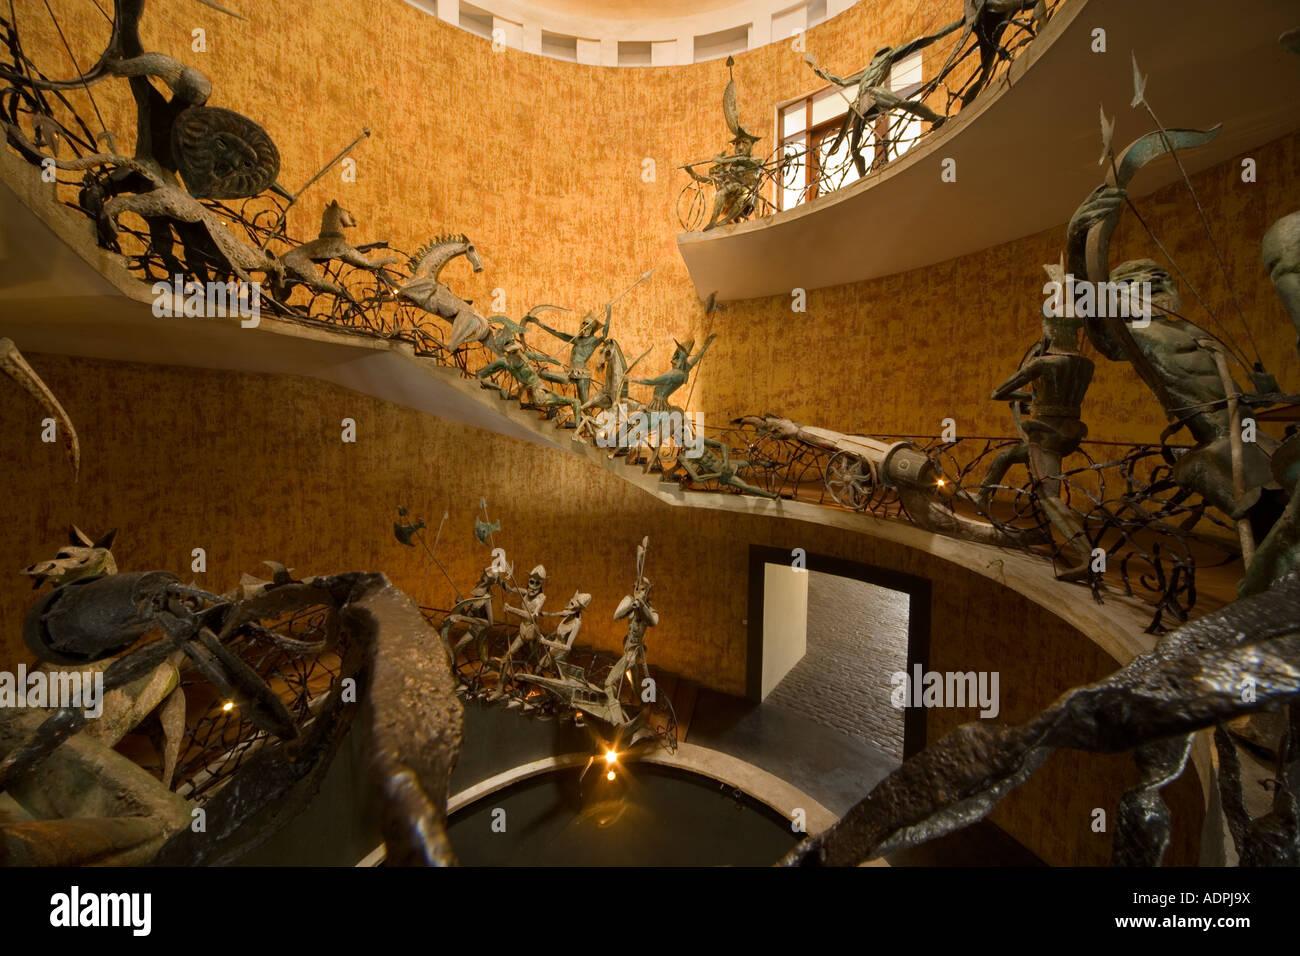 http://c7.alamy.com/comp/ADPJ9X/lighthouse-hotel-galle-sri-lanka-entrance-with-sinhalese-warrior-sculptures-ADPJ9X.jpg